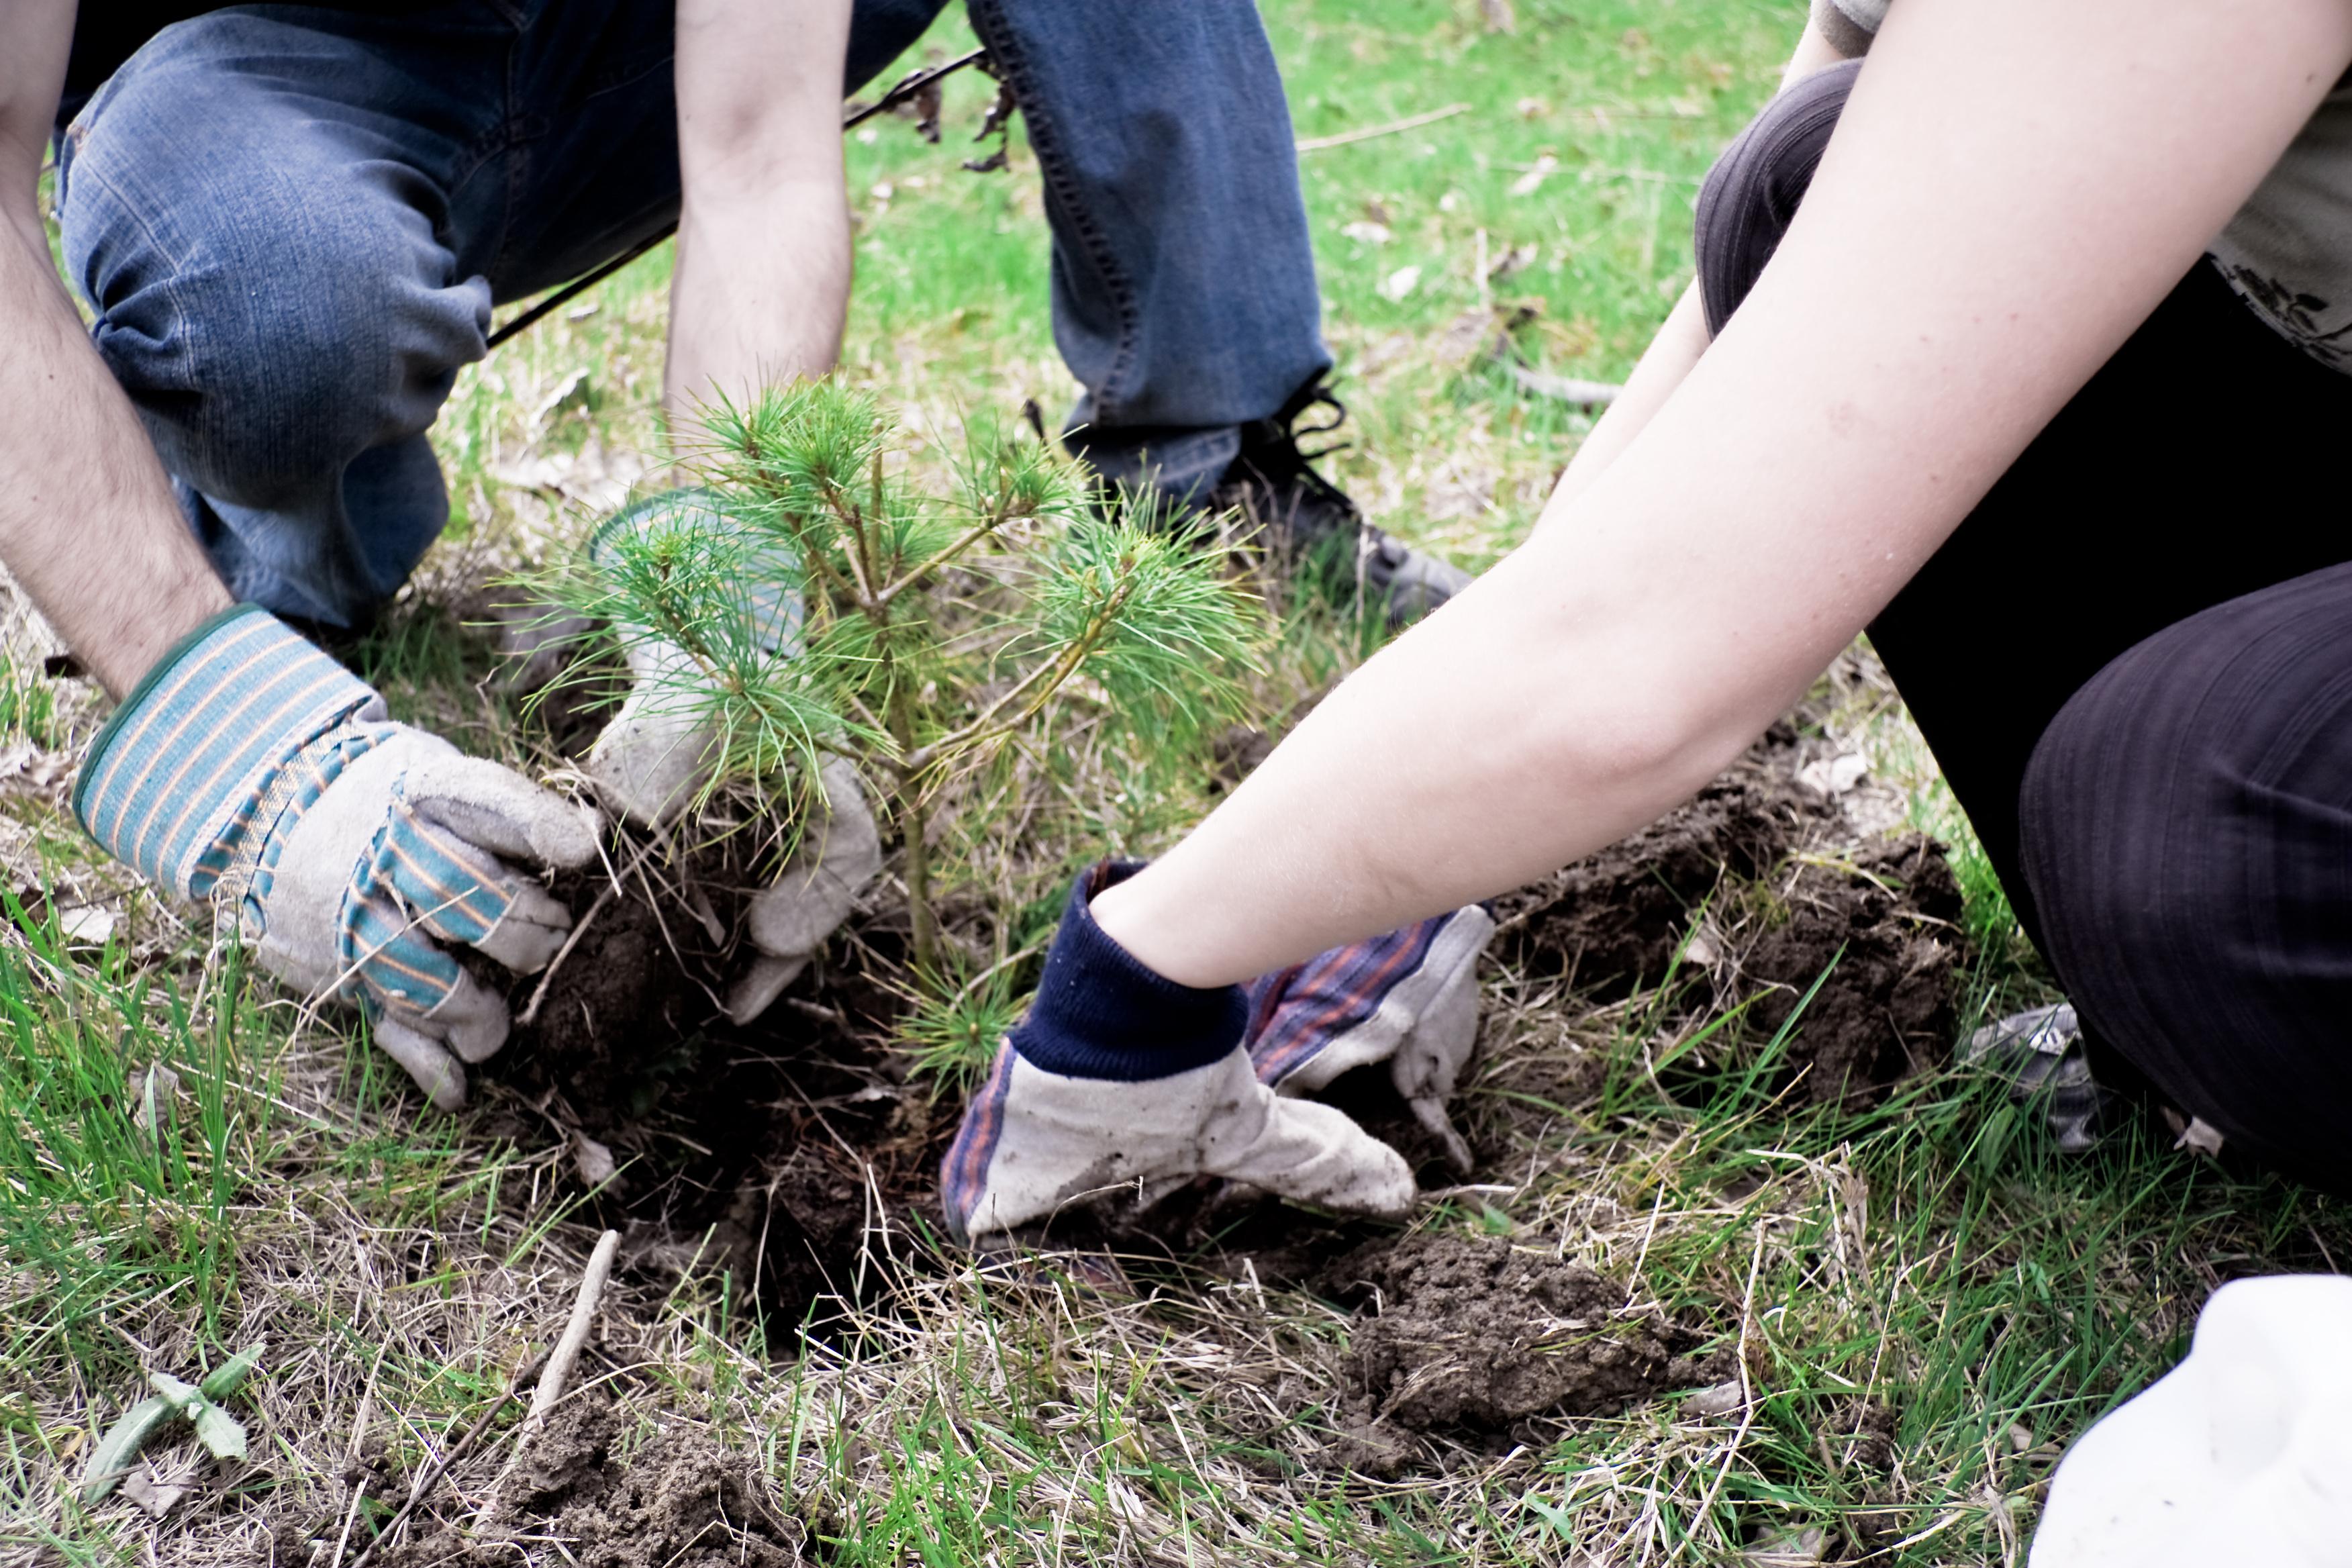 File:Tree planting 001.jpg - Wikimedia Commons